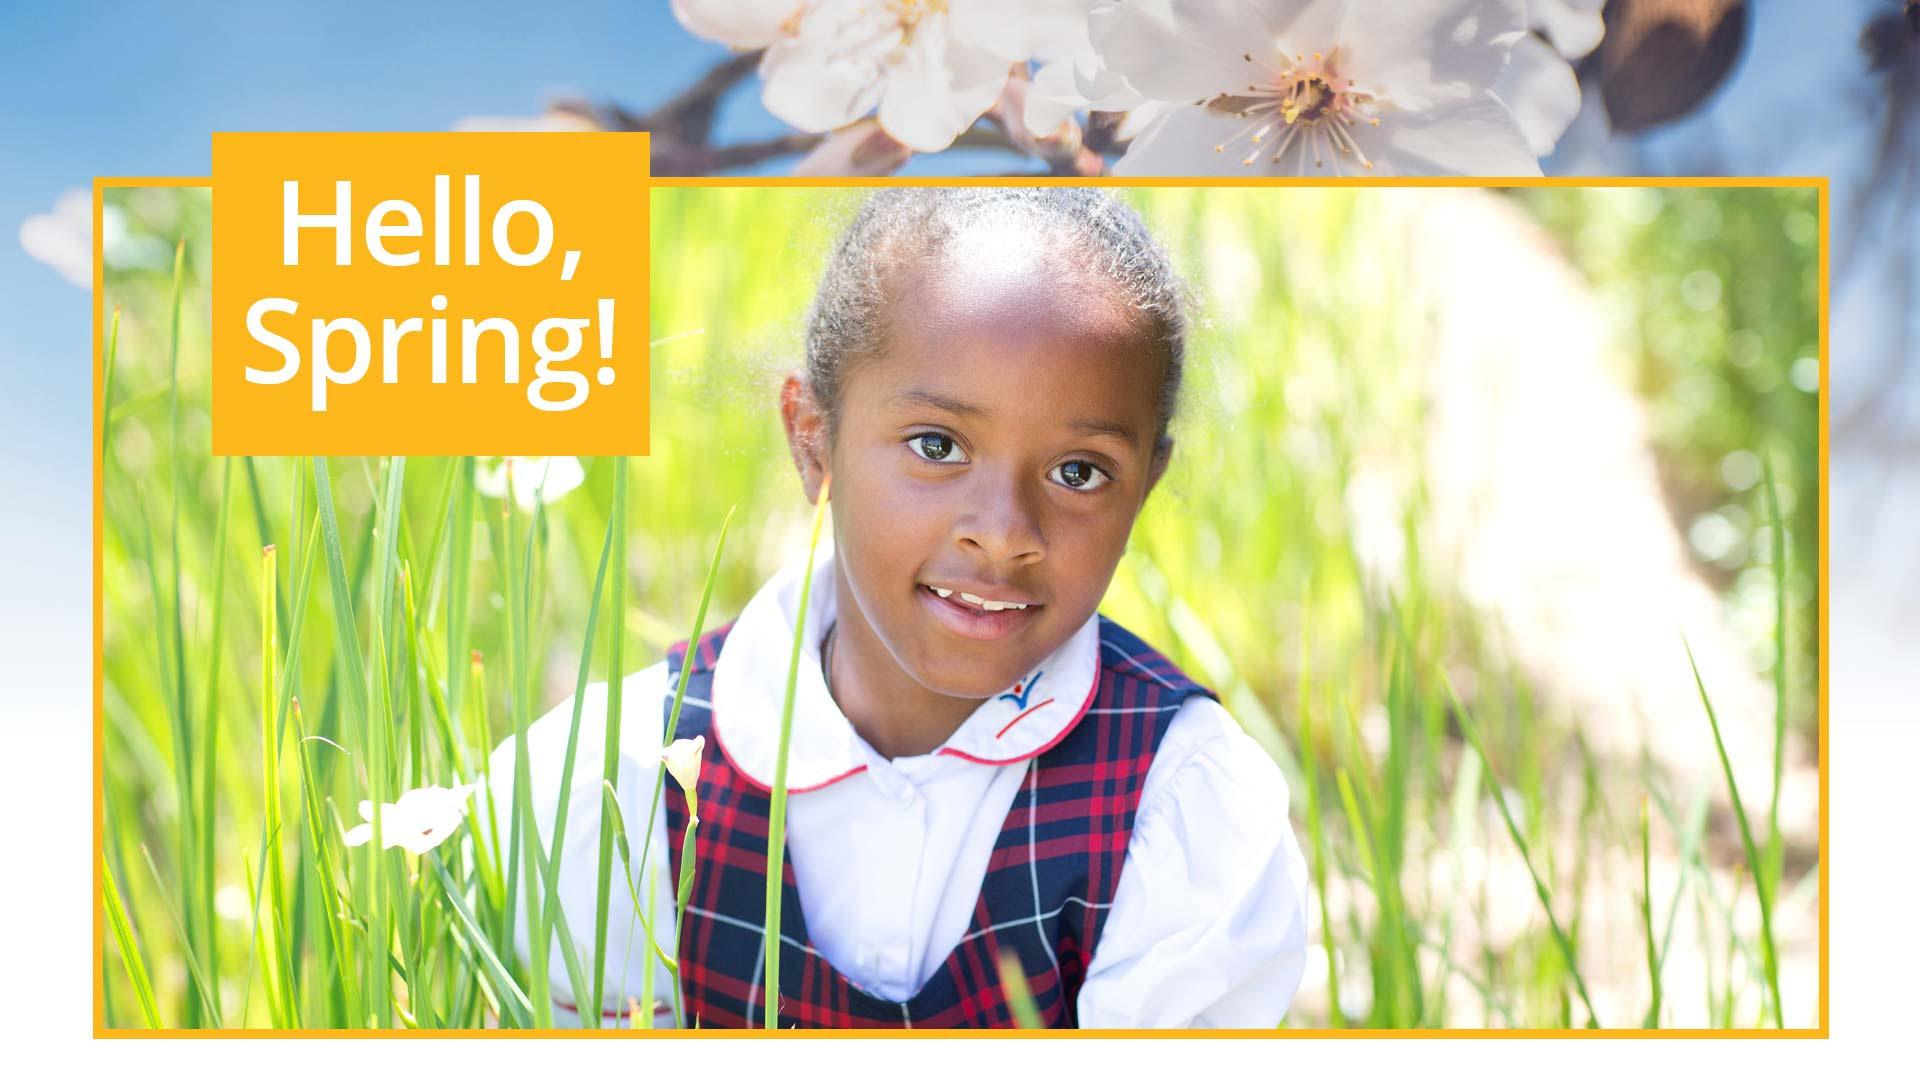 Hello, Spring - a girl in a DENNIS school uniform welcomes Spring